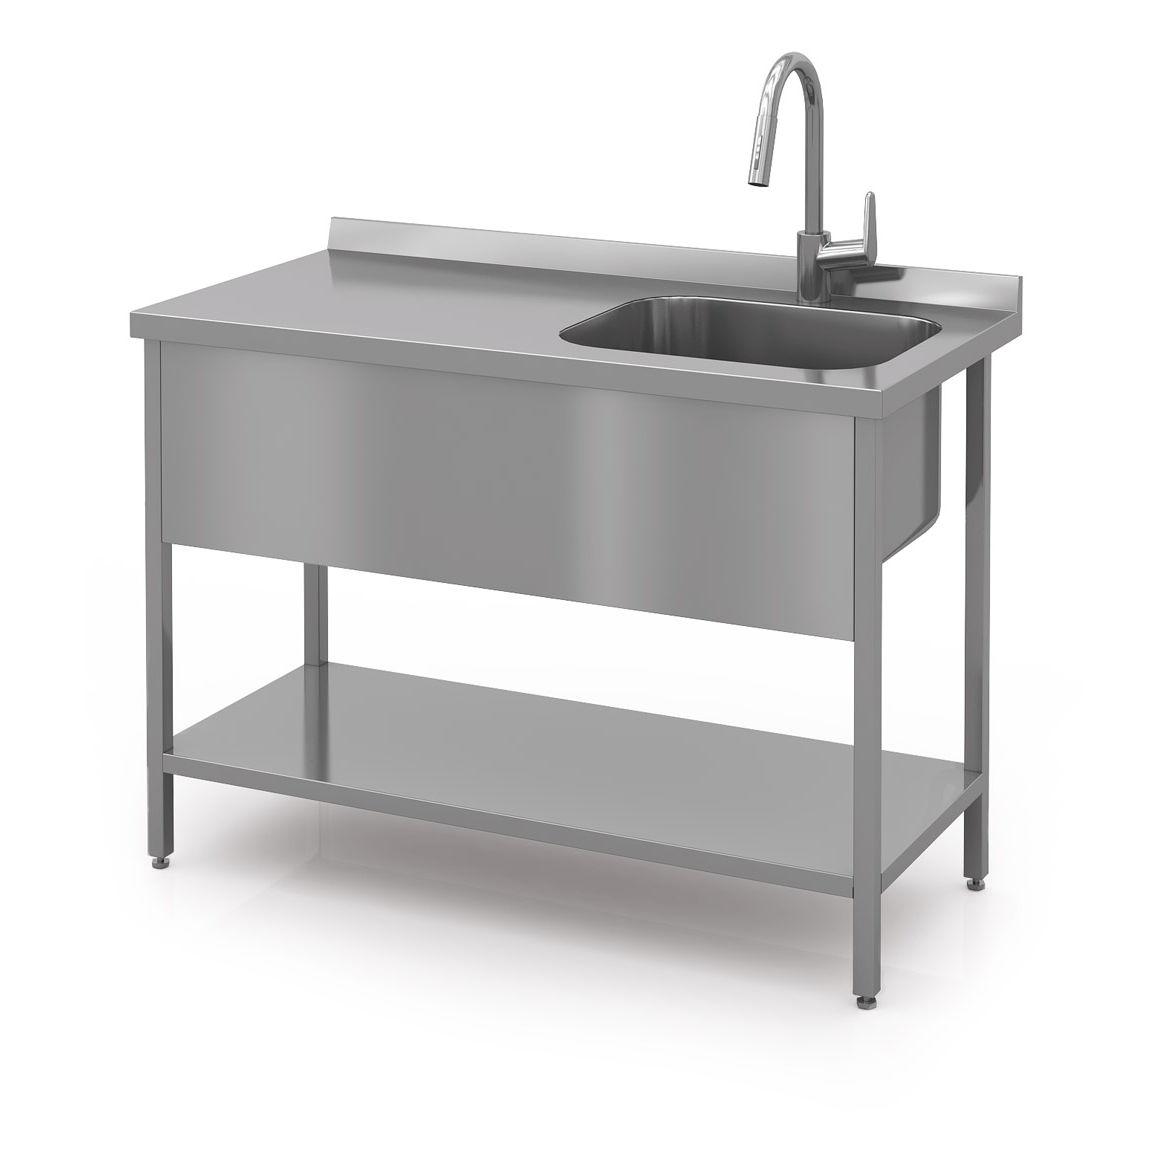 stainless steel prep table modern